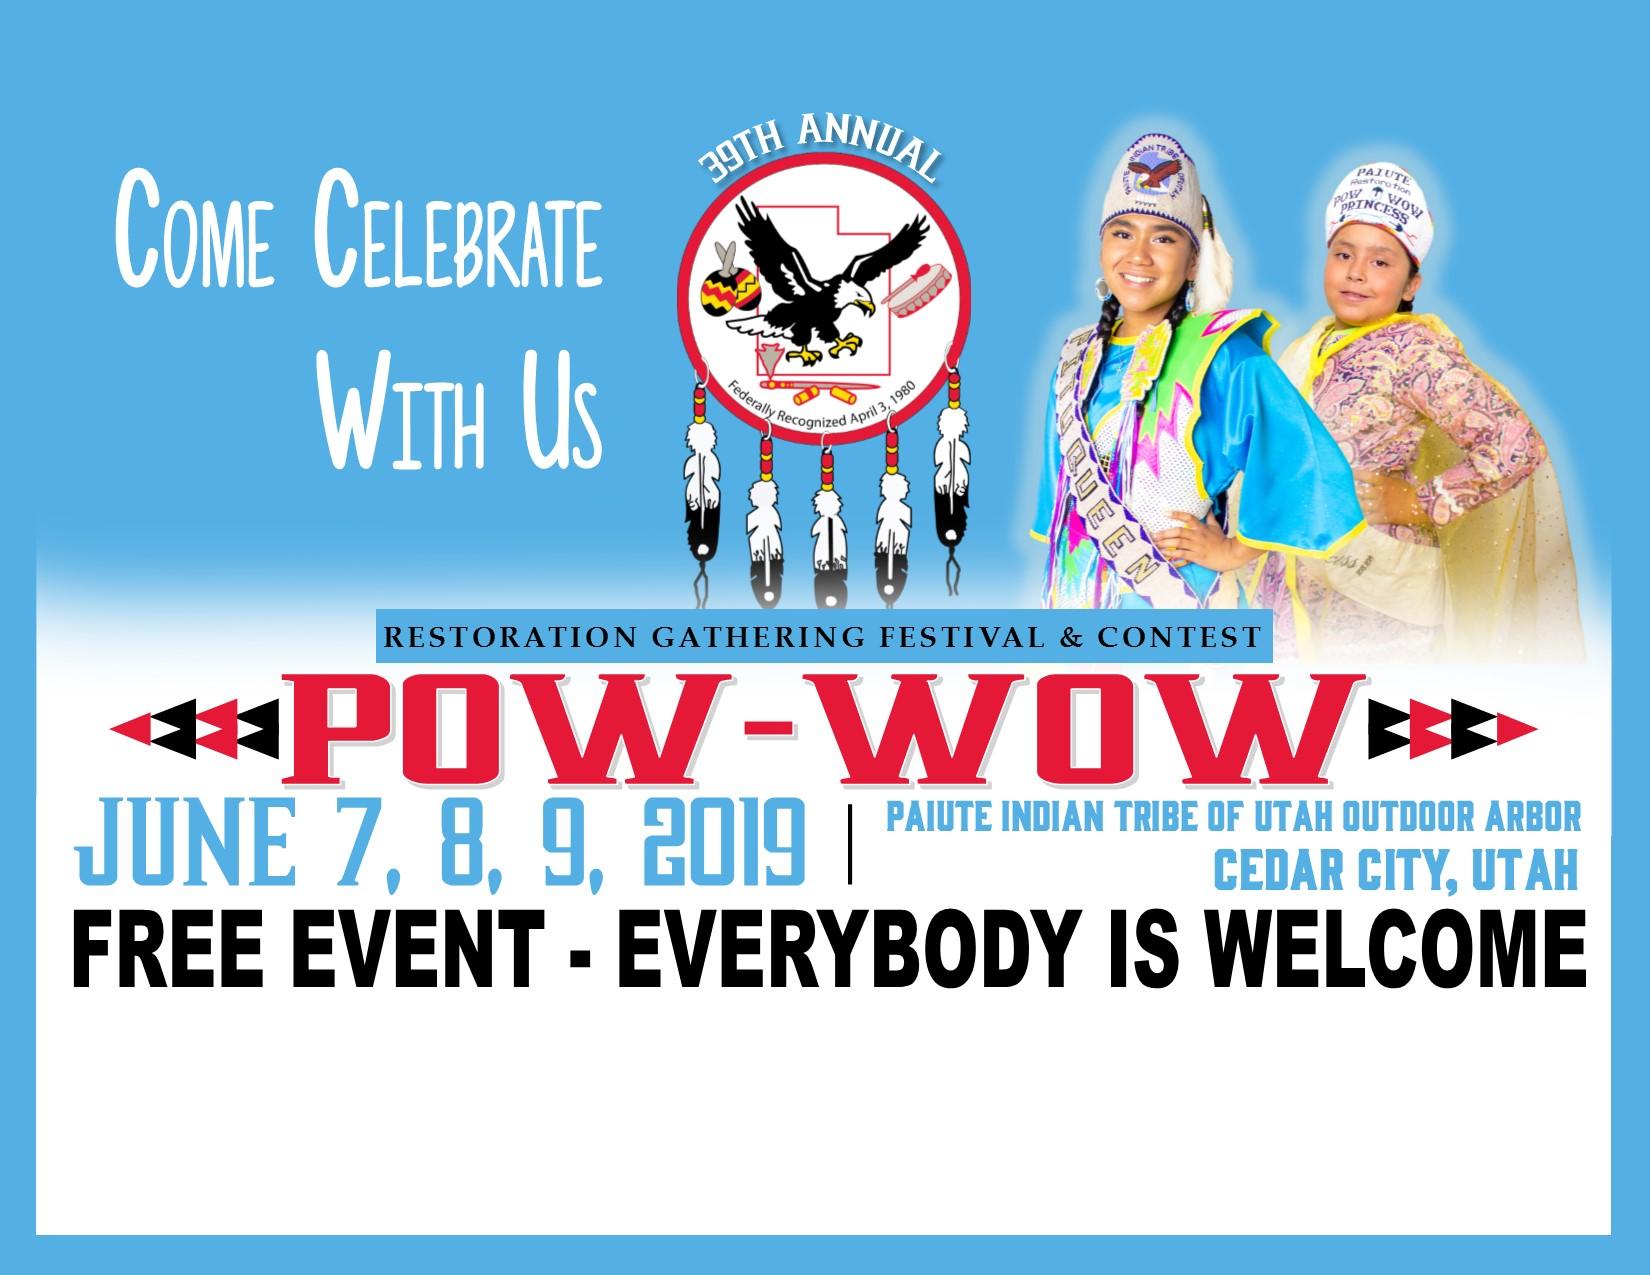 Restoration Gathering Festival & Contest Pow Wow